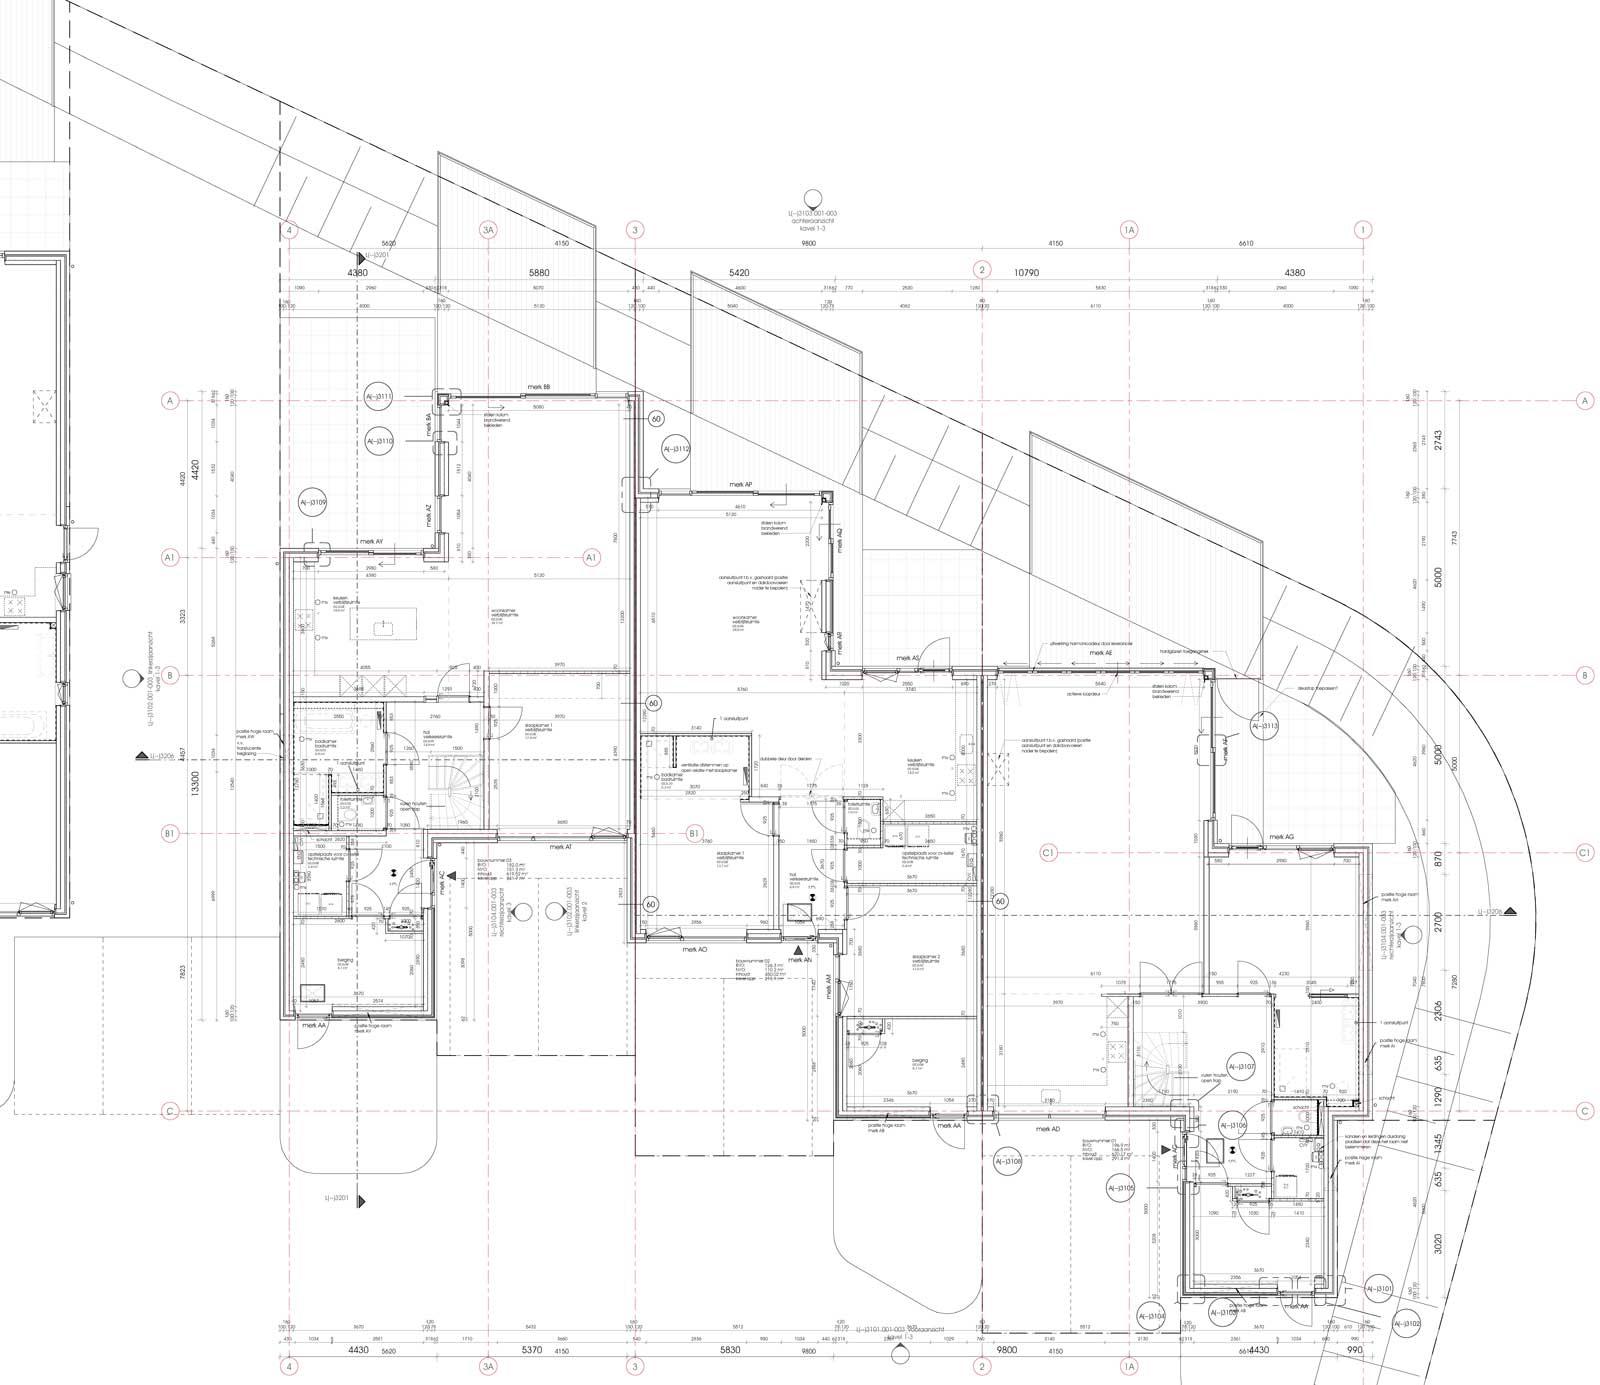 Teylingerhof Bleiswijk CPO Patiowoningen - Begane grond bouwnummer 1 t/m 3